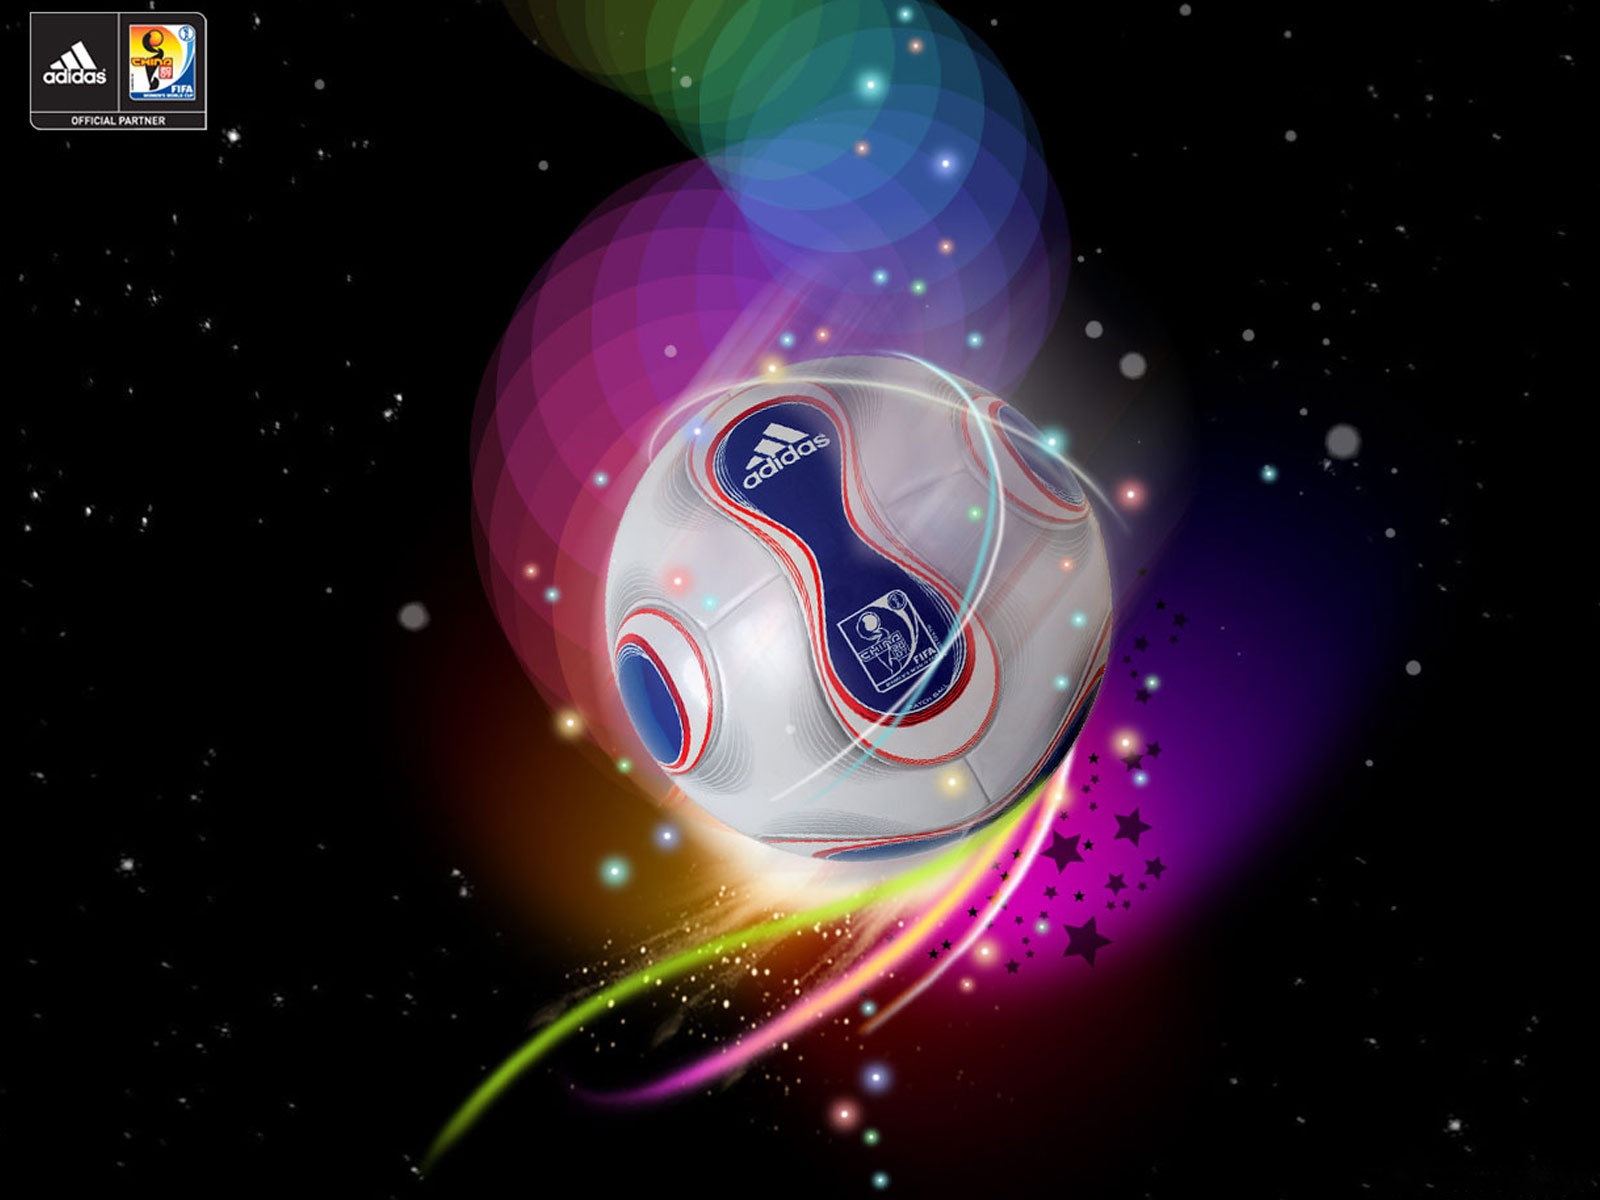 http://4.bp.blogspot.com/_3UTUy1R1gRQ/TBWzCESIqxI/AAAAAAAAAak/TXOCHgj1D3k/s1600/FIFA_World_Cup_Wallpapers_10.jpg